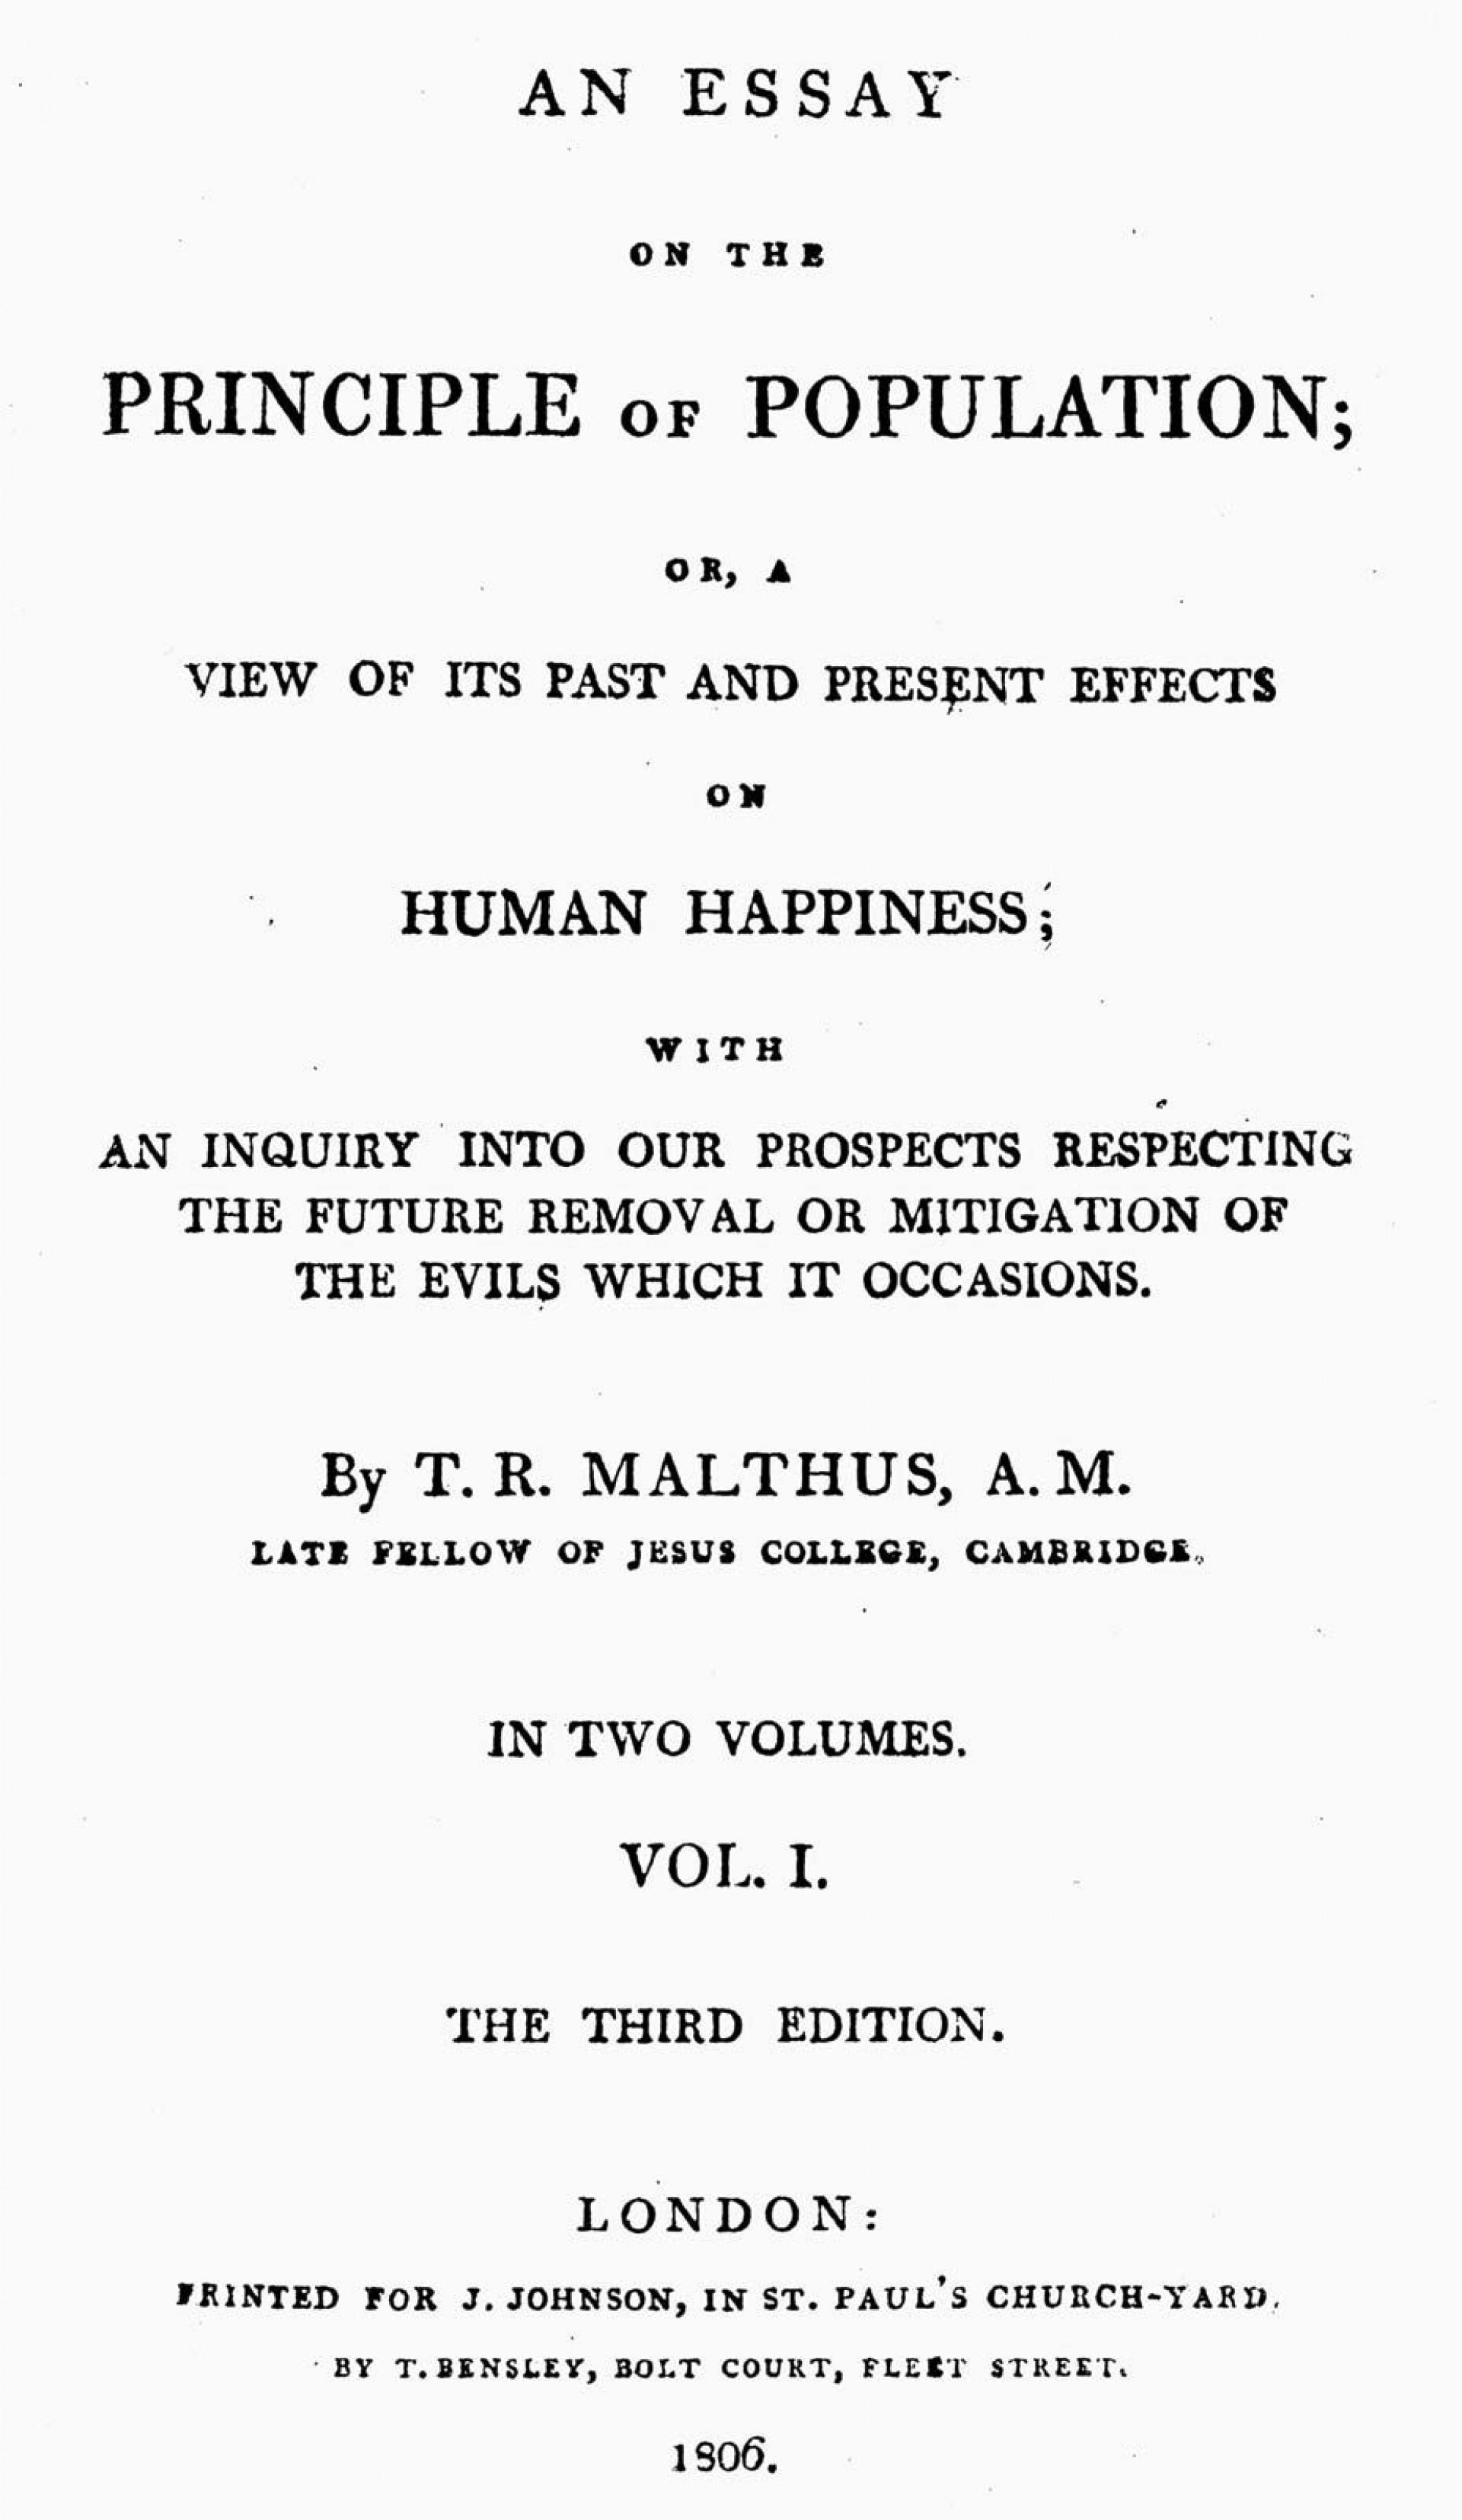 017 Thomas Malthus Essay On The Principle Of Population Stupendous After Reading Malthus's Principles Darwin Got Idea That Ap Euro 1920